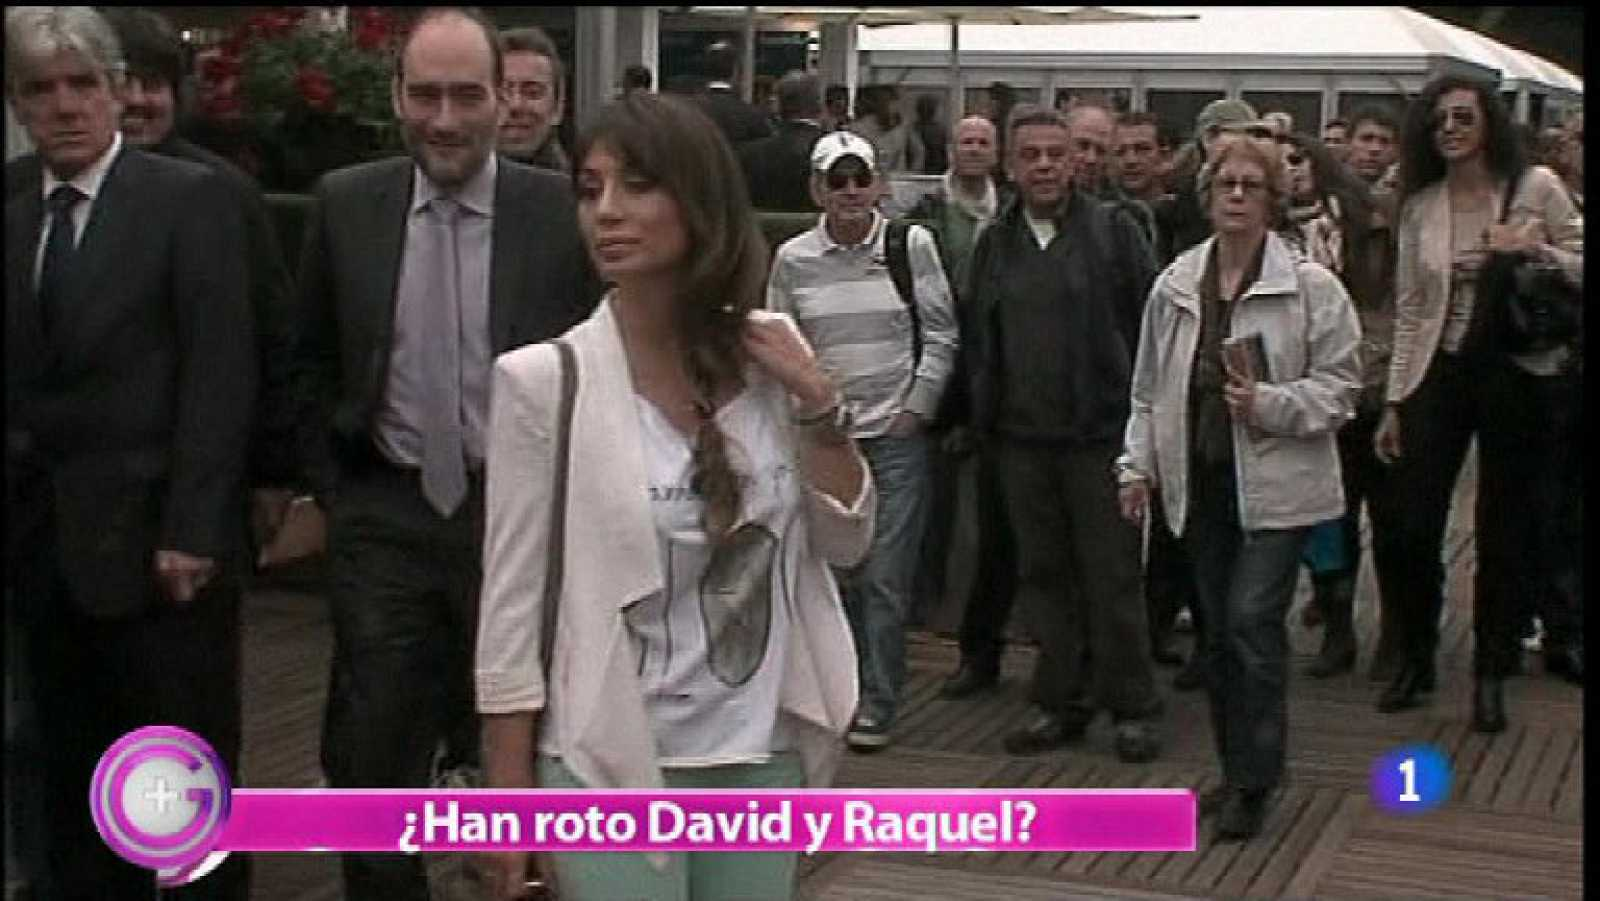 ¿Han roto David Bisbal y Raquel Jiménez ?